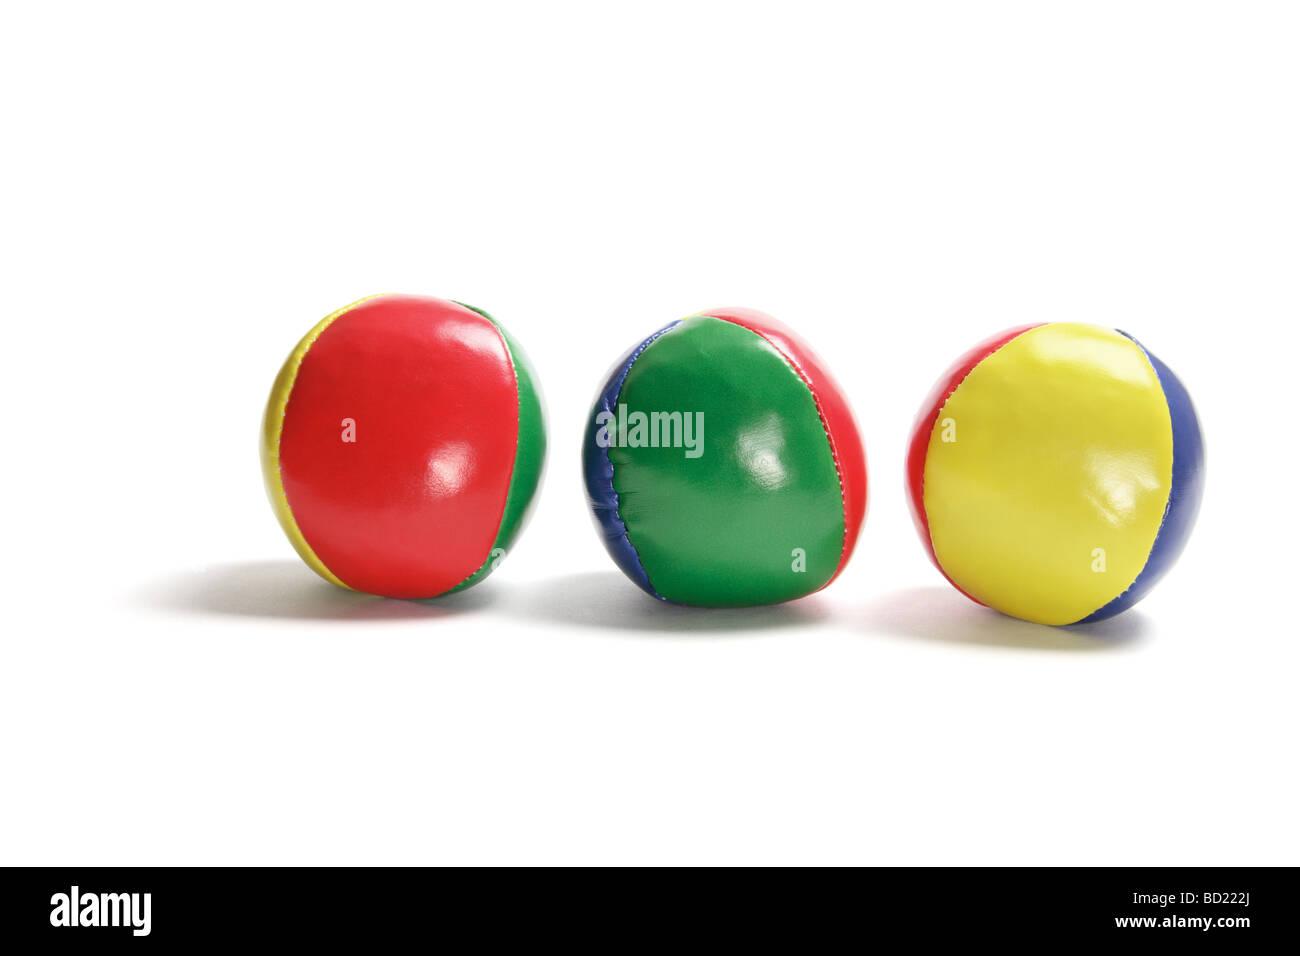 Juggling Balls - Stock Image